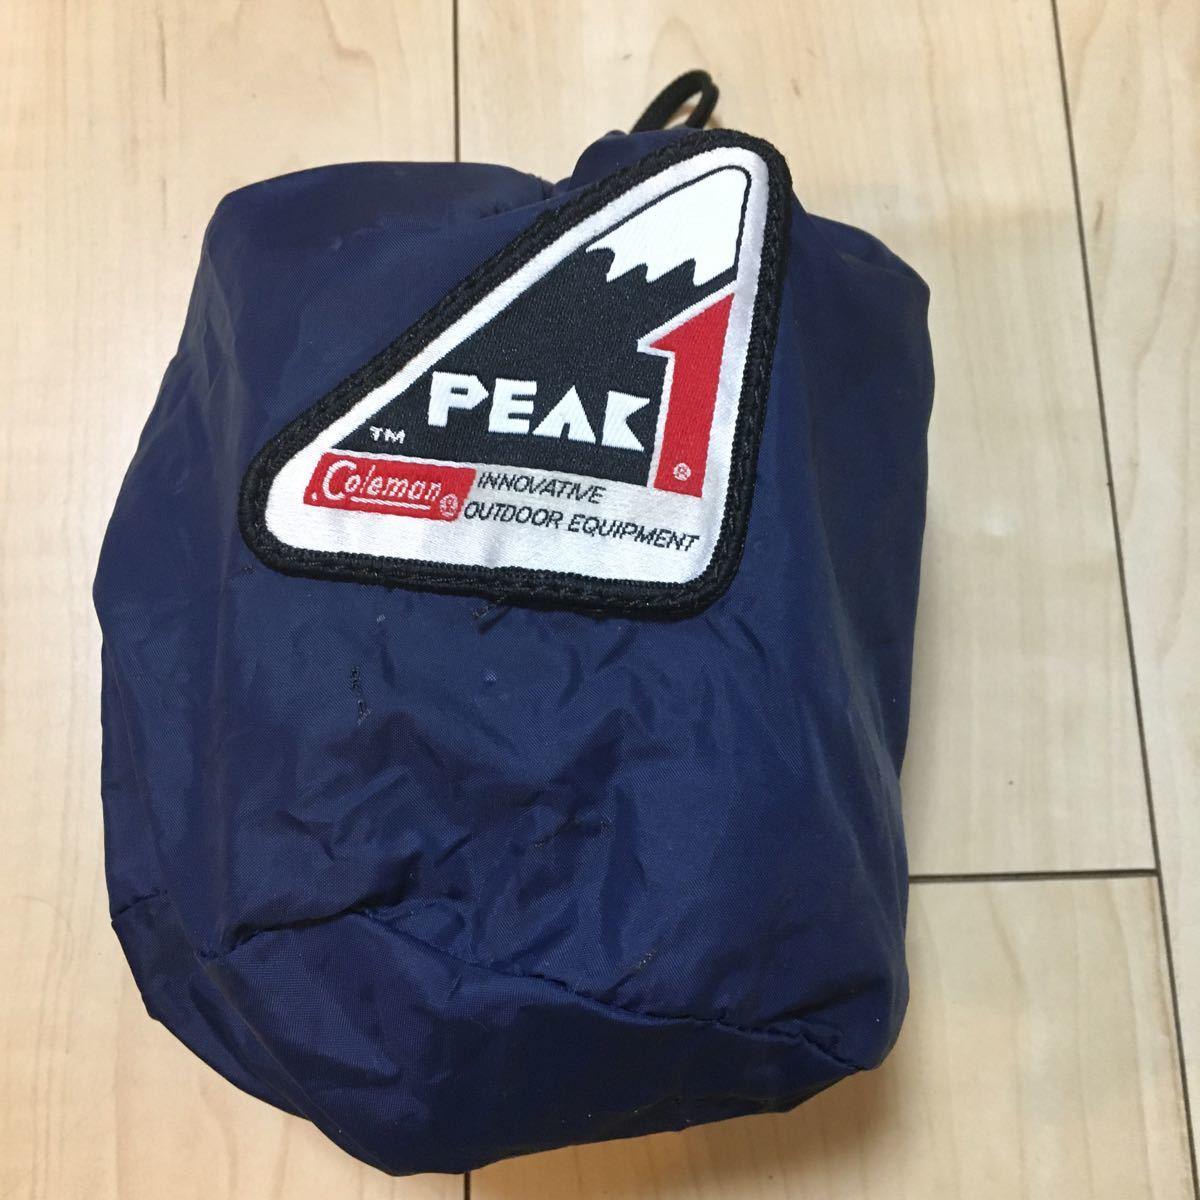 Coleman コールマン シングルバーナー PEAK1  STOVE コールマンストーブ ツーレバー